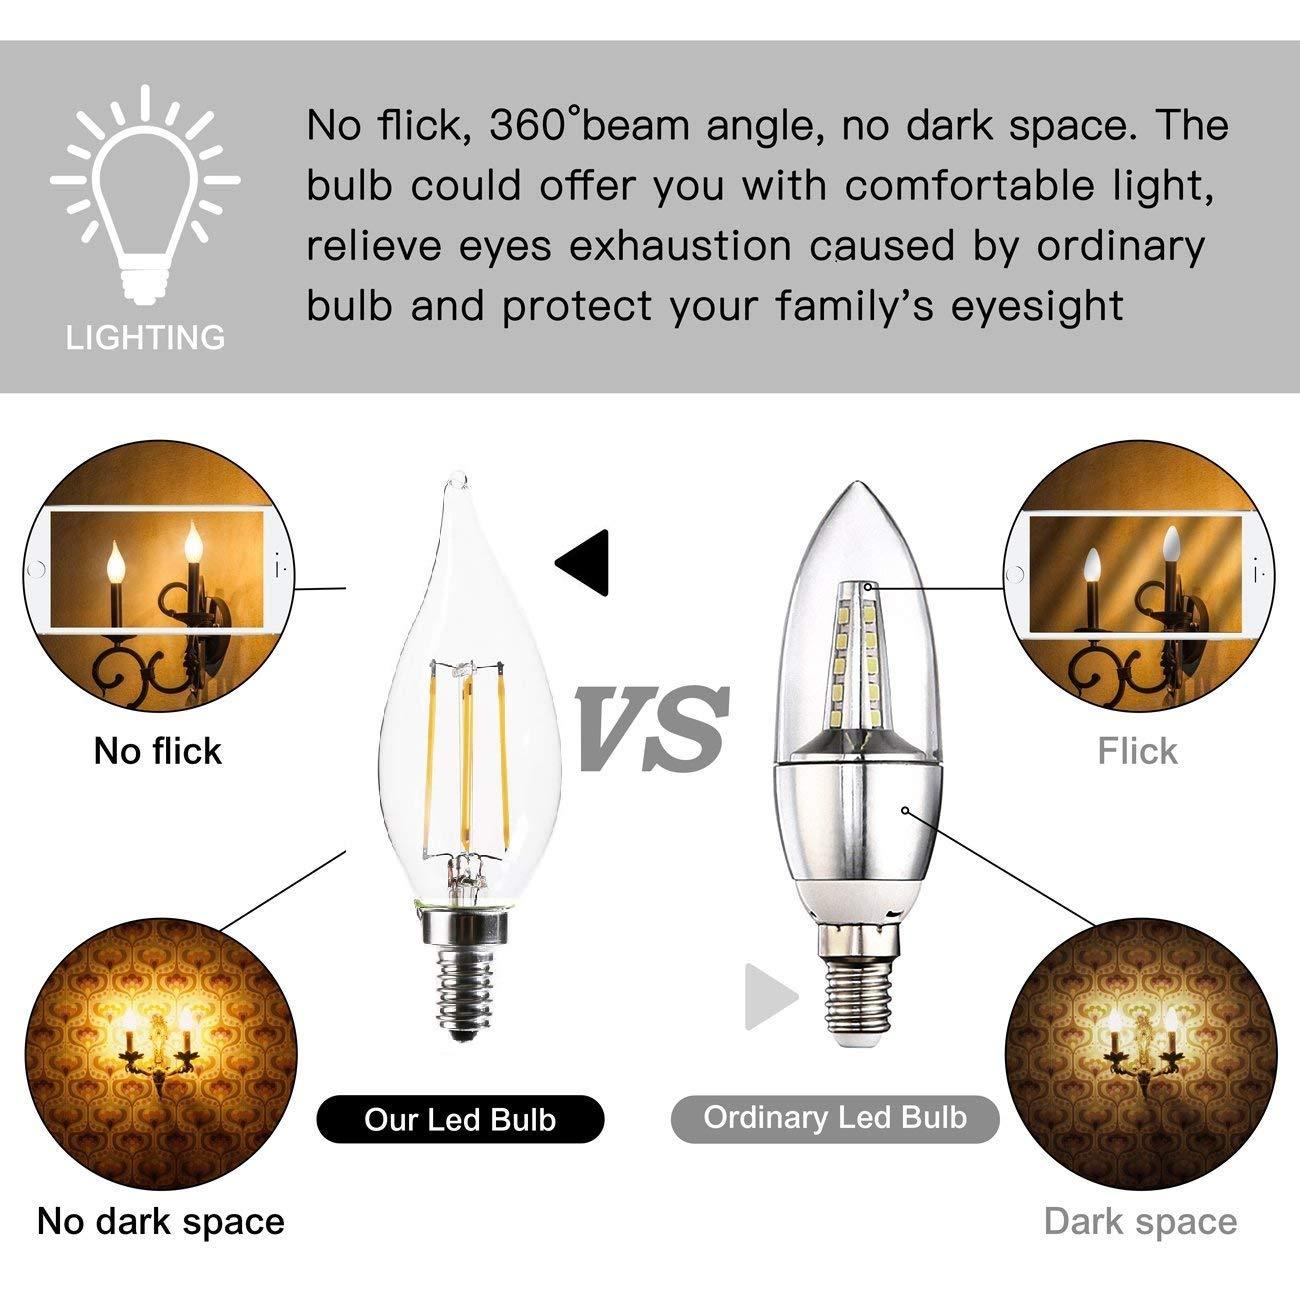 E12 led Bulbs 60 Watt Equivalent Candelabra Bulb led E12 CA11 Dimmable 2700K Warm White 4.5W 450LM CA11 Flame Tip LED Chandelier Light Bulbs UL Listed (2pack)